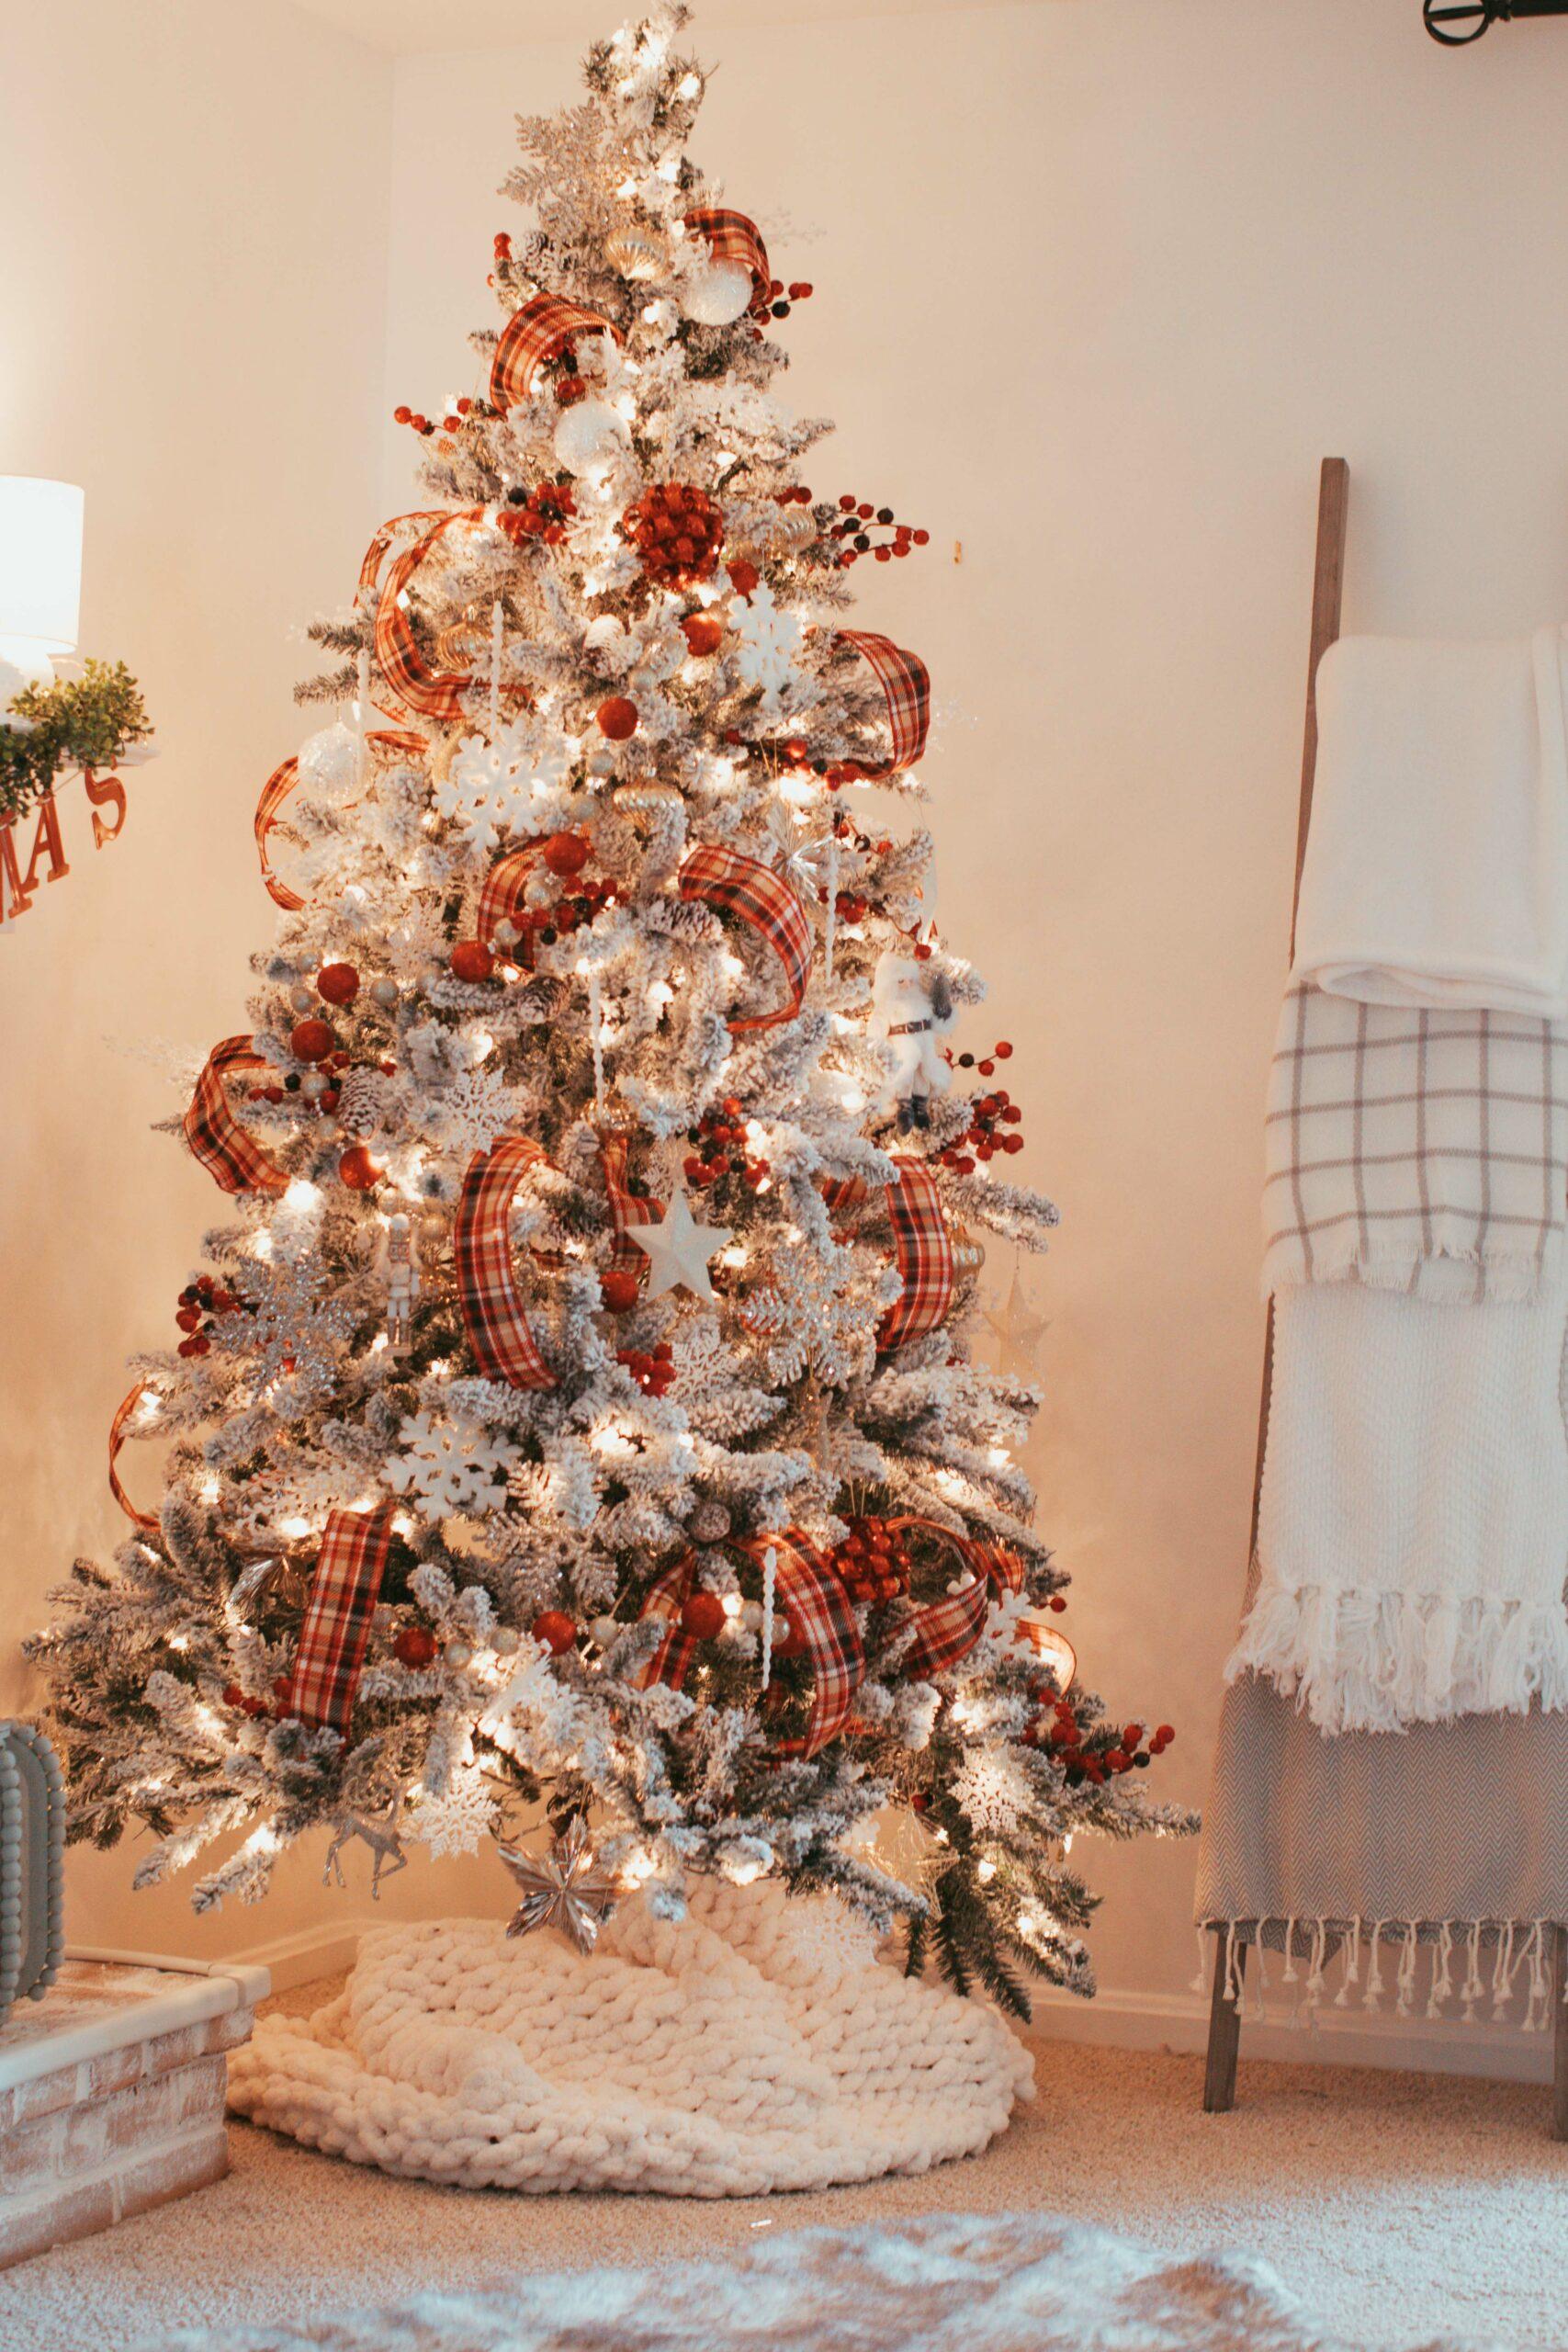 DIY Hand Crochet Chunky Blanket | Budget Christmas Gift angela lanter hello gorgeous